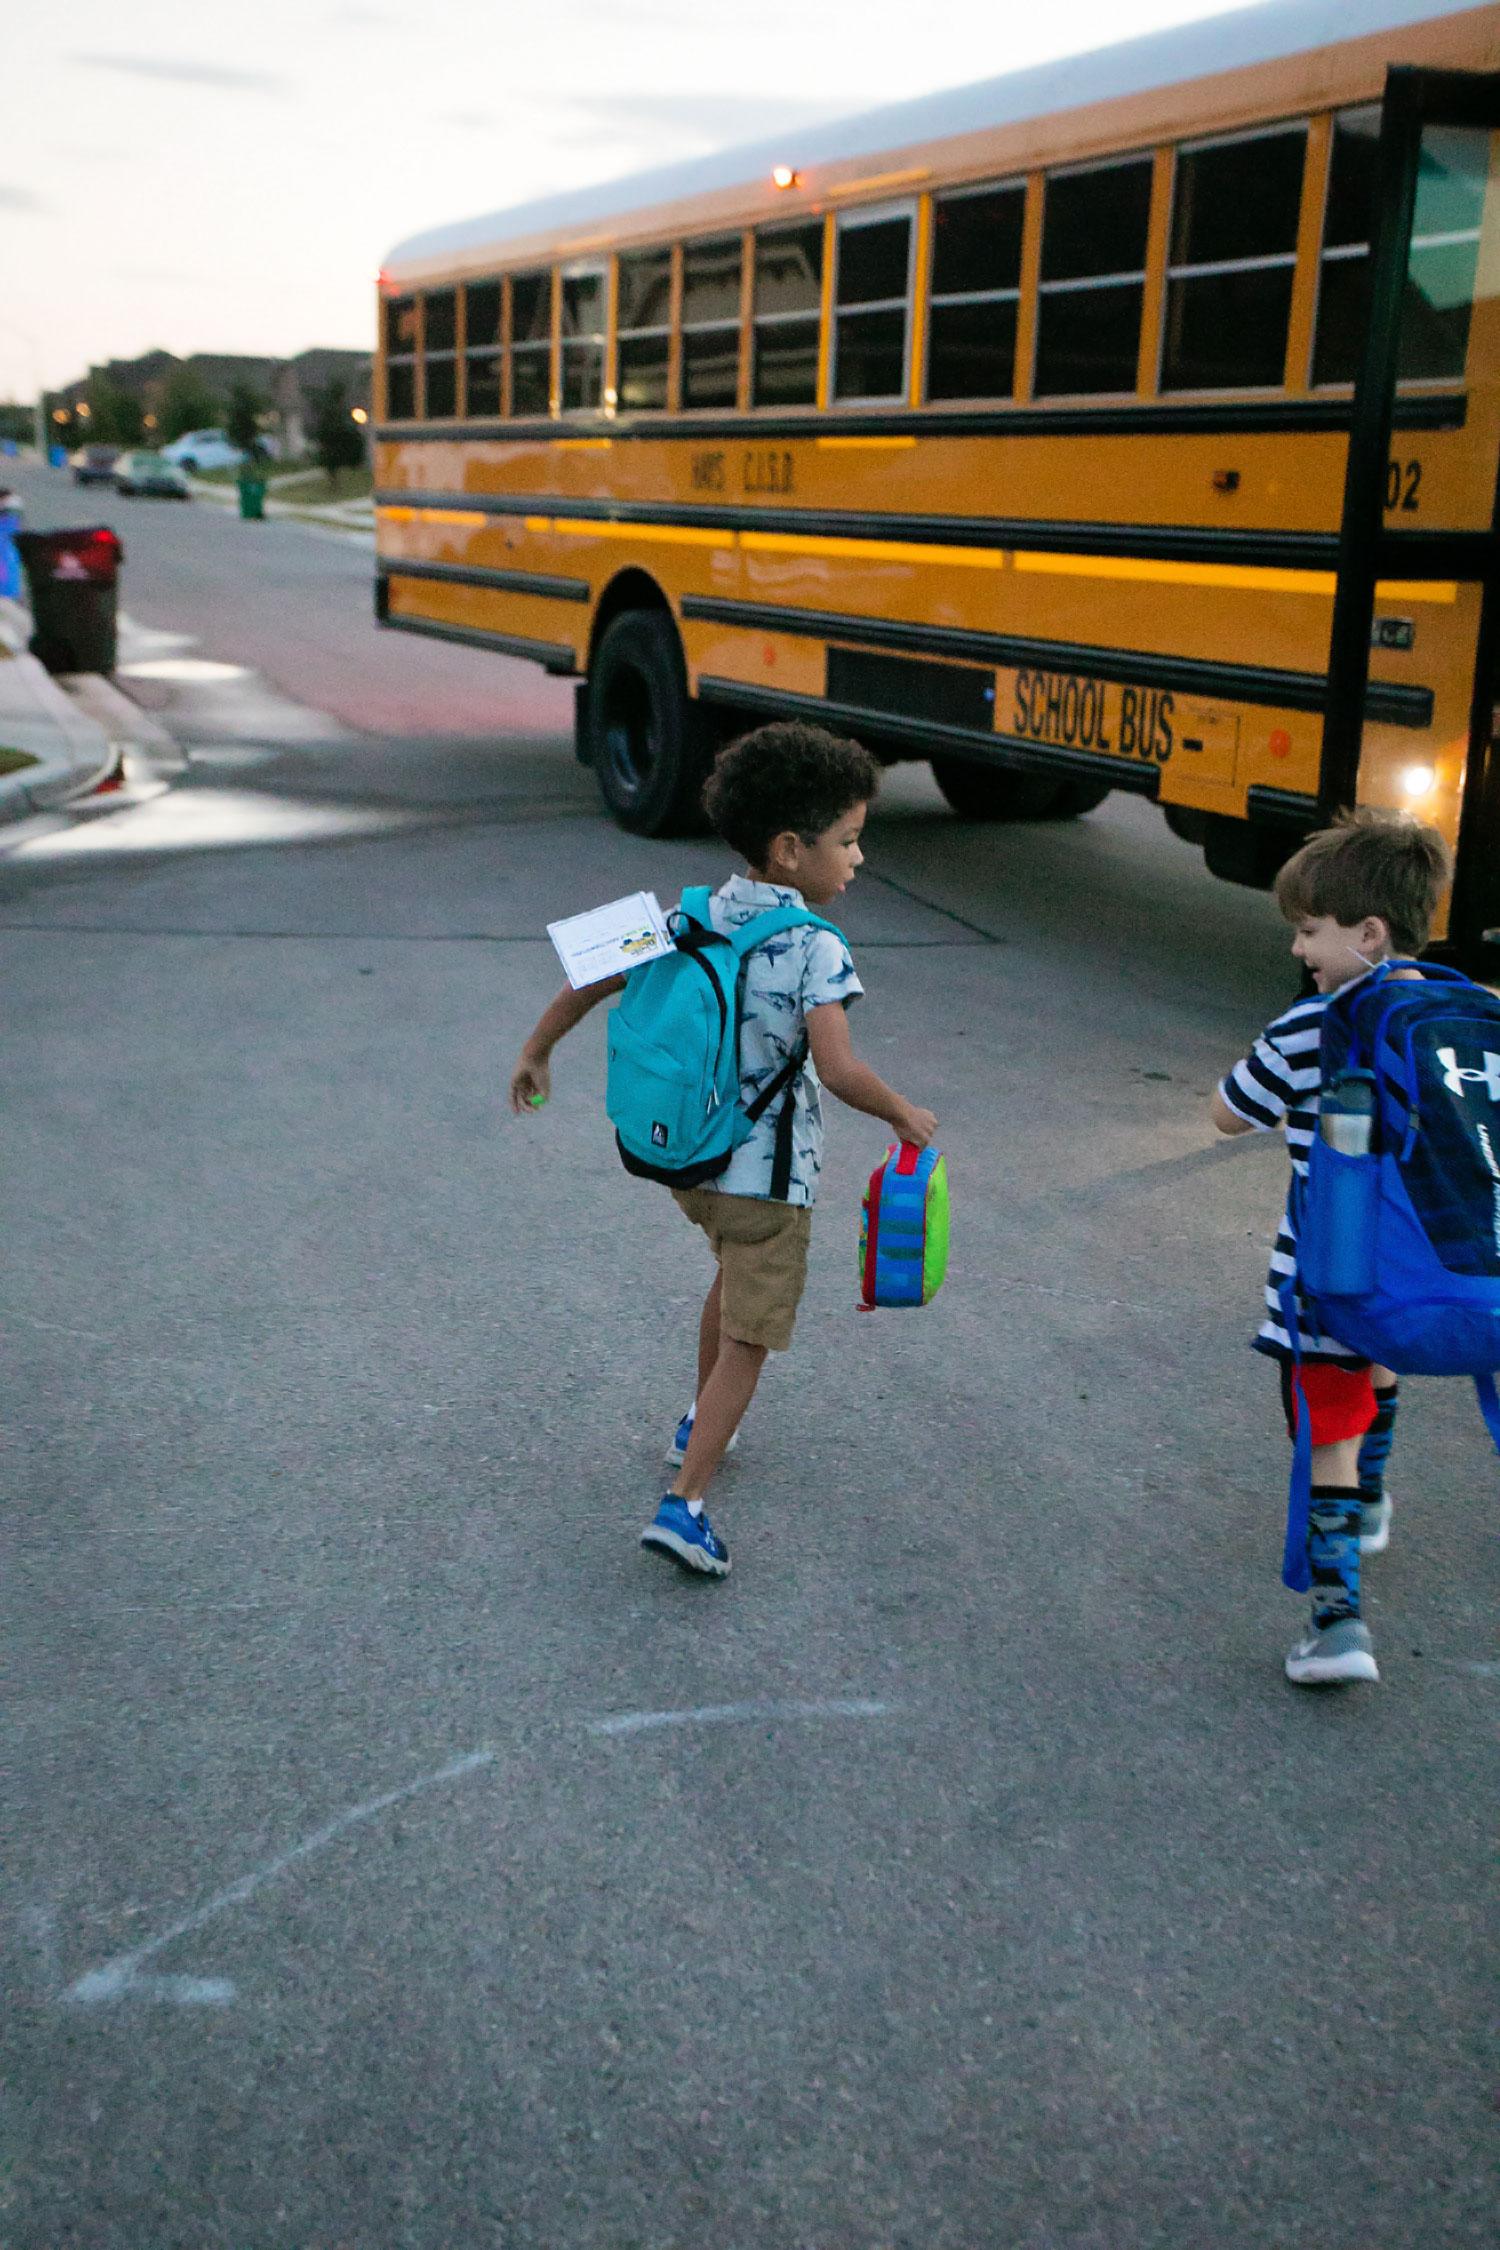 Early bus ride kindergarten